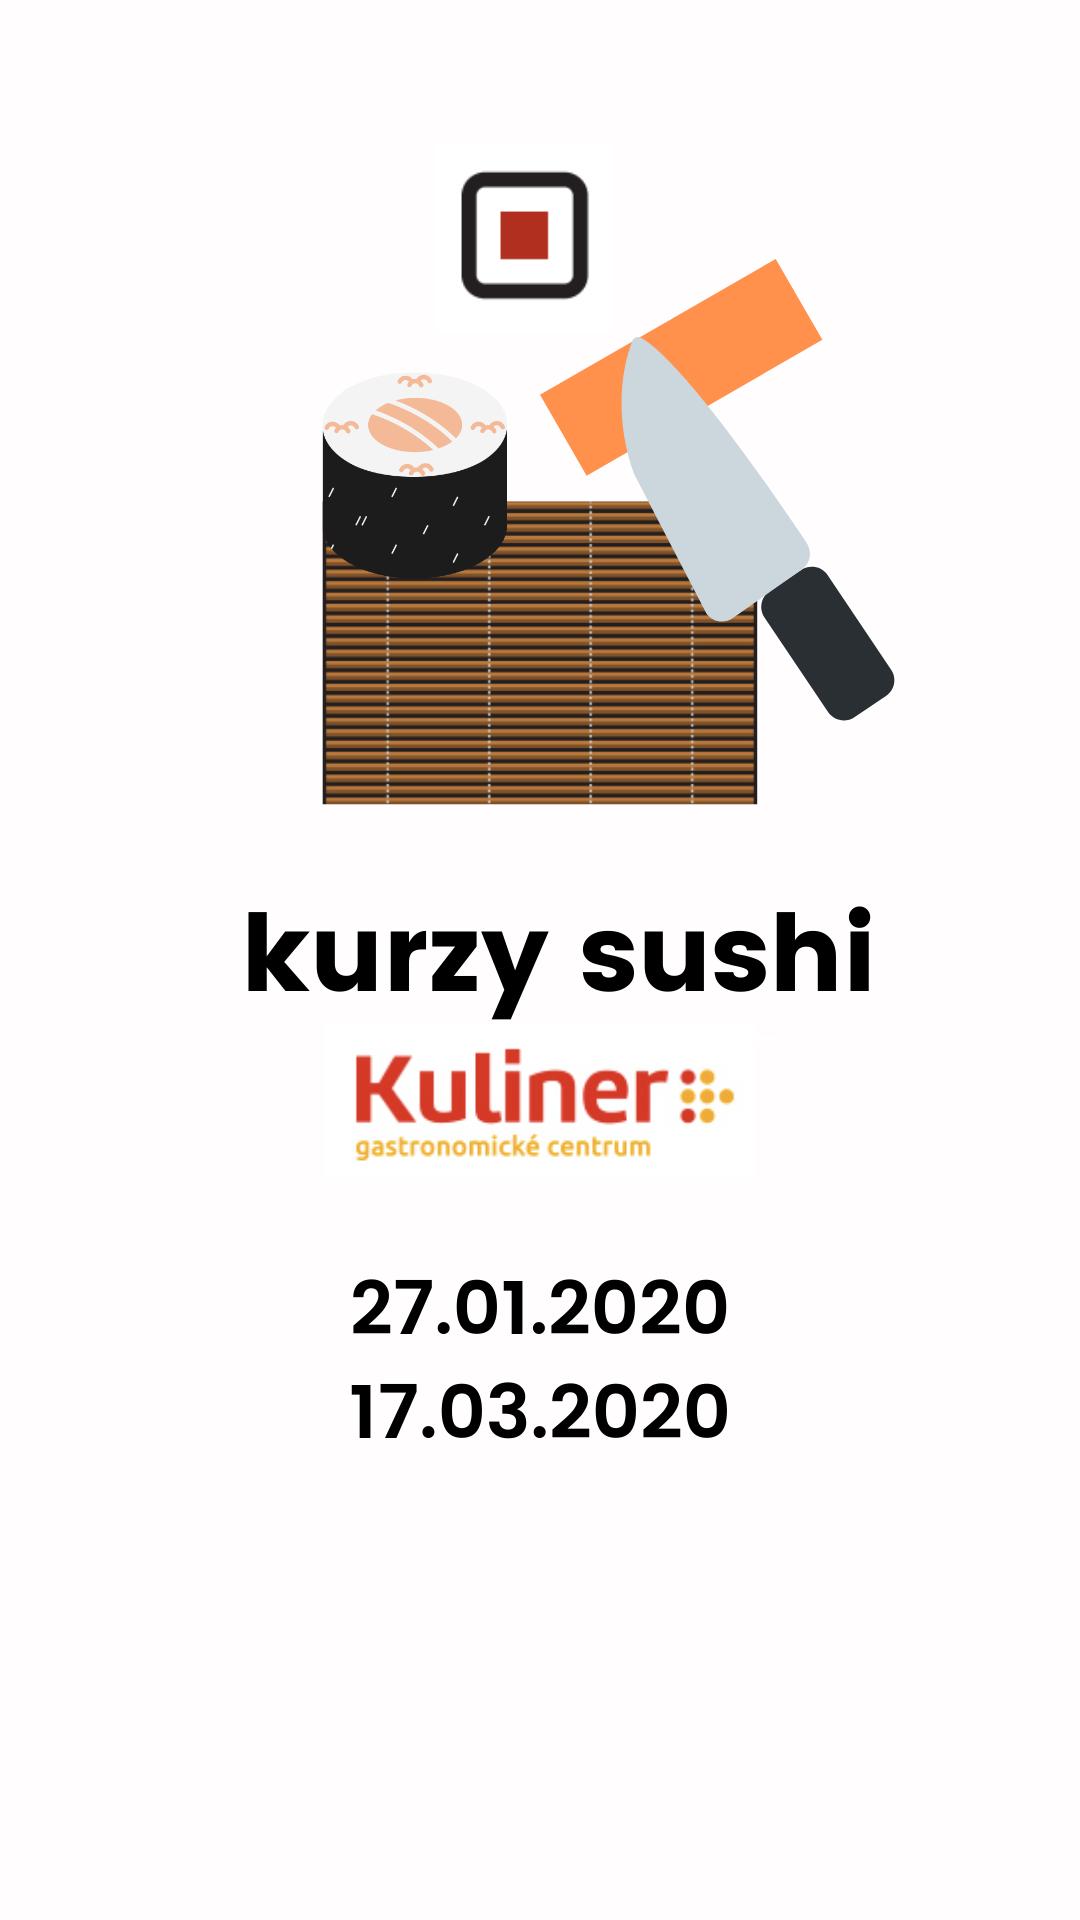 kurzy sushi novy (4)